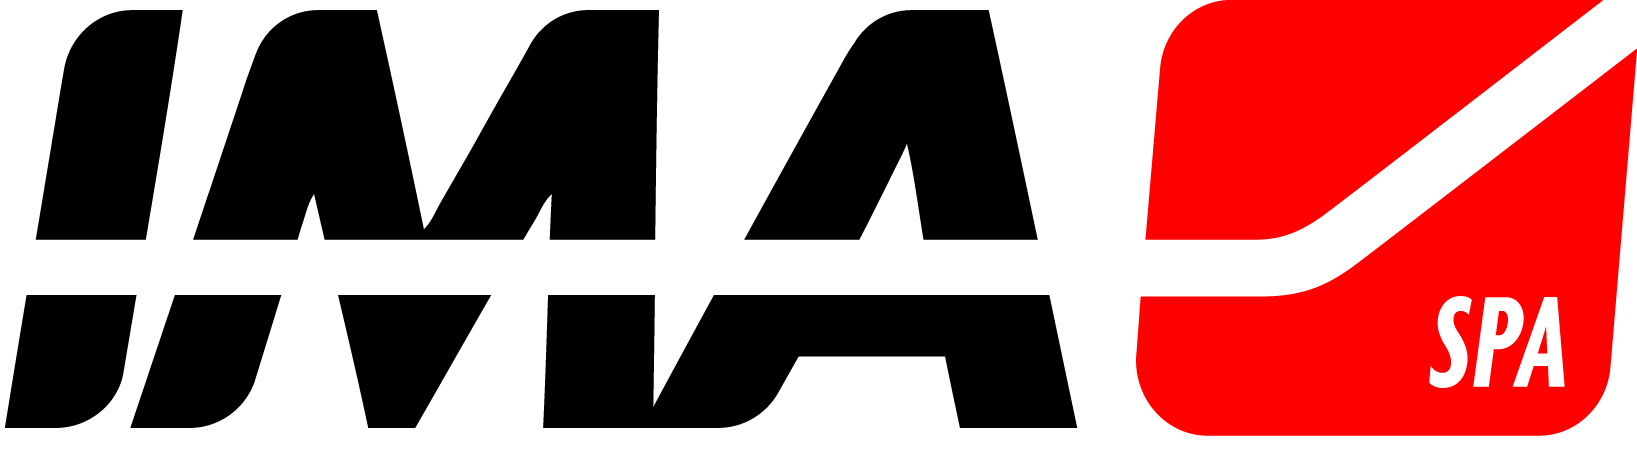 http://www.ima-pharma.com/